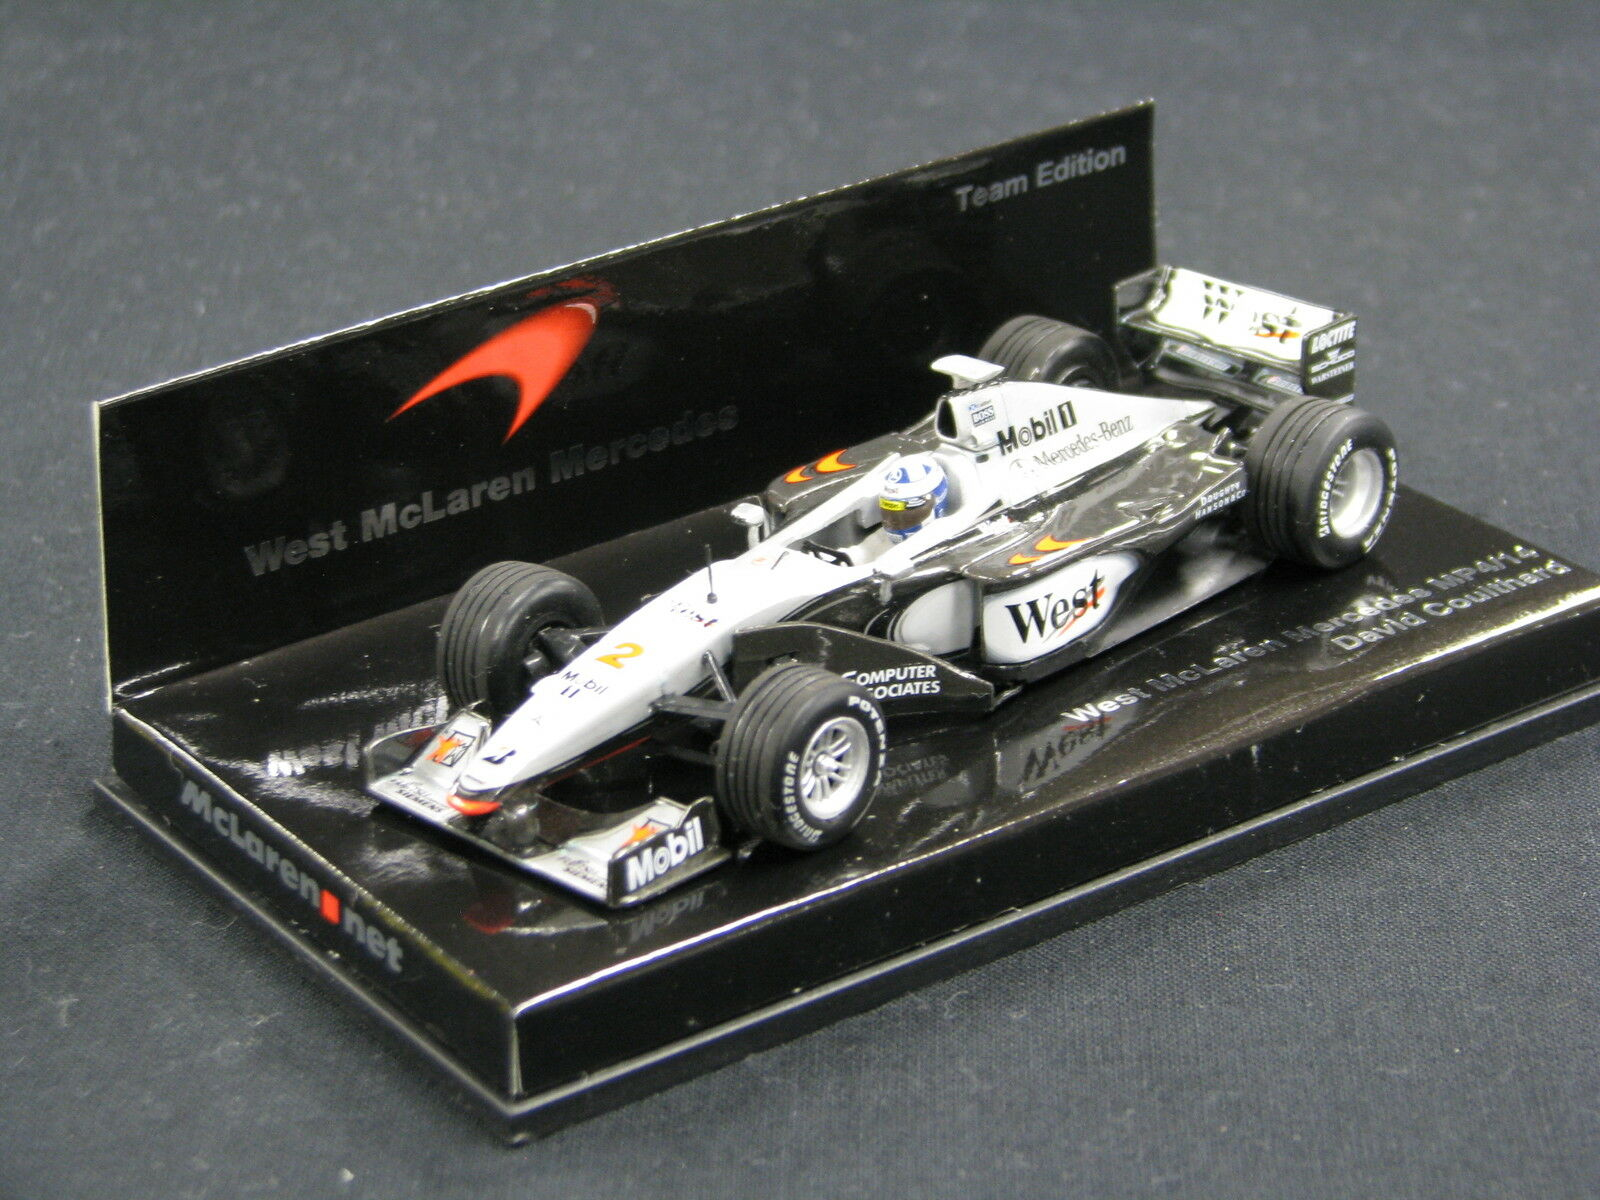 Minichamps West McLaren Mercedes MP4 14 1999 1 43  2 David Coulthard (GBR) (JS)